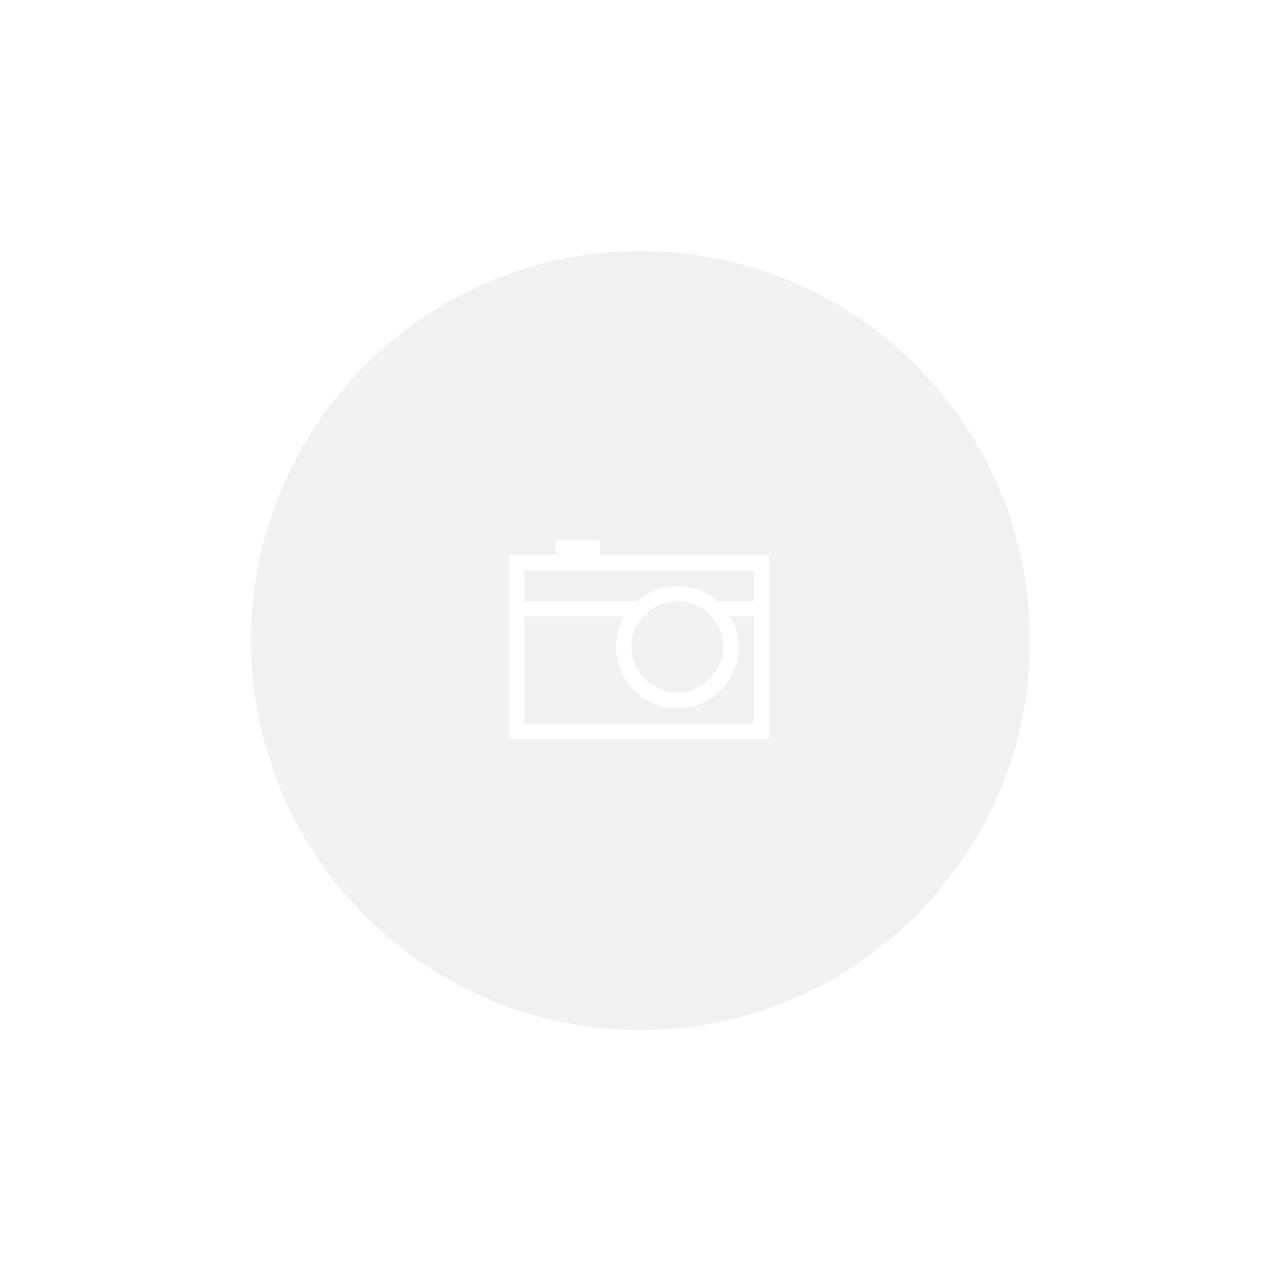 Kit Espumante Terranova Brut